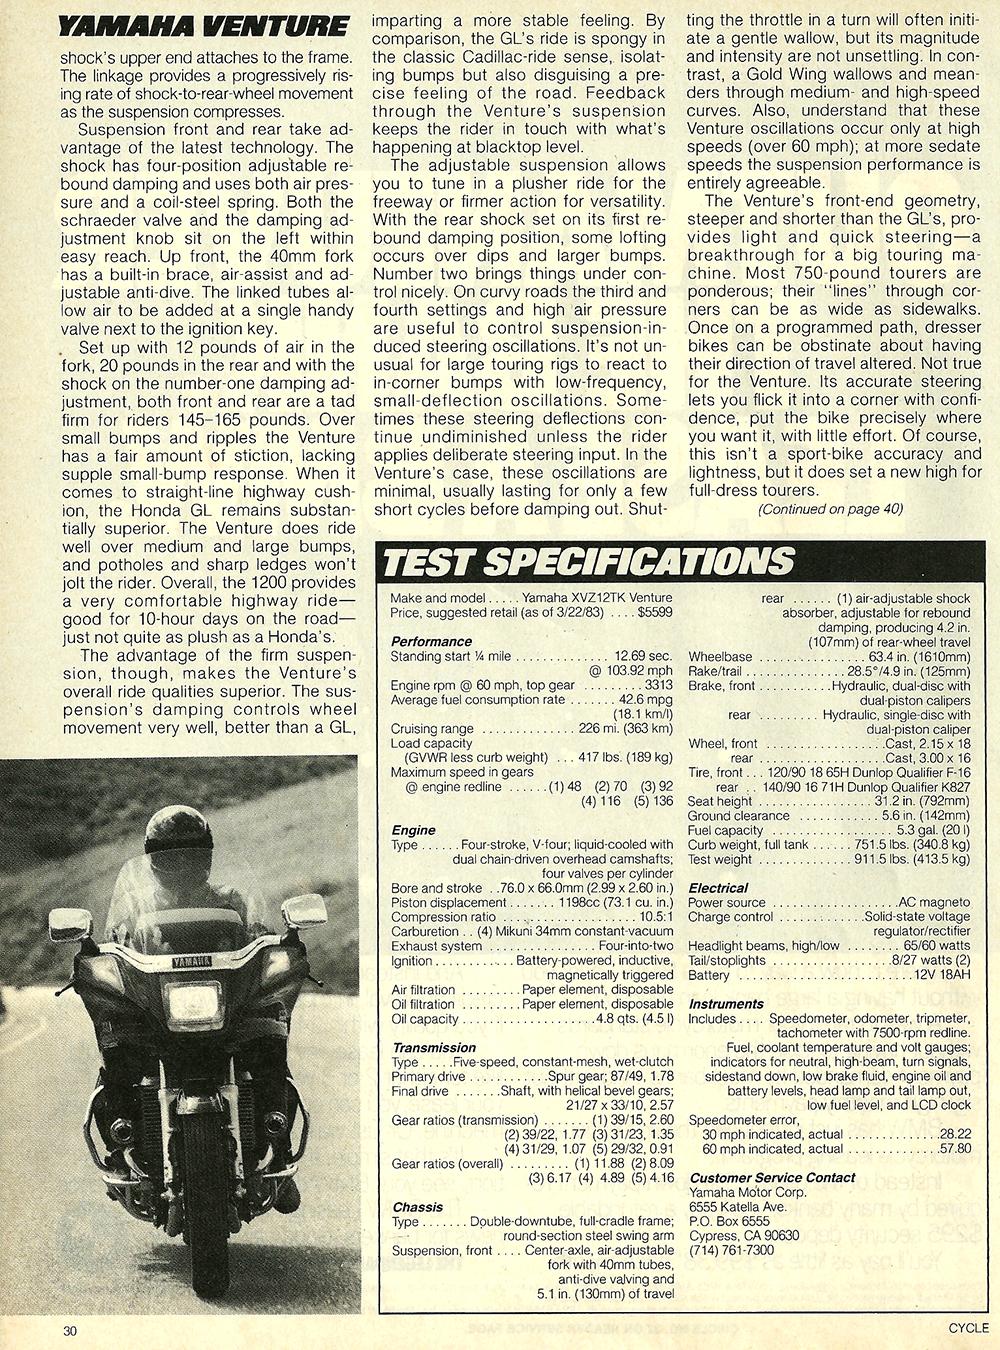 1983 Yamaha XVZ12TK Venture road test 08.jpg